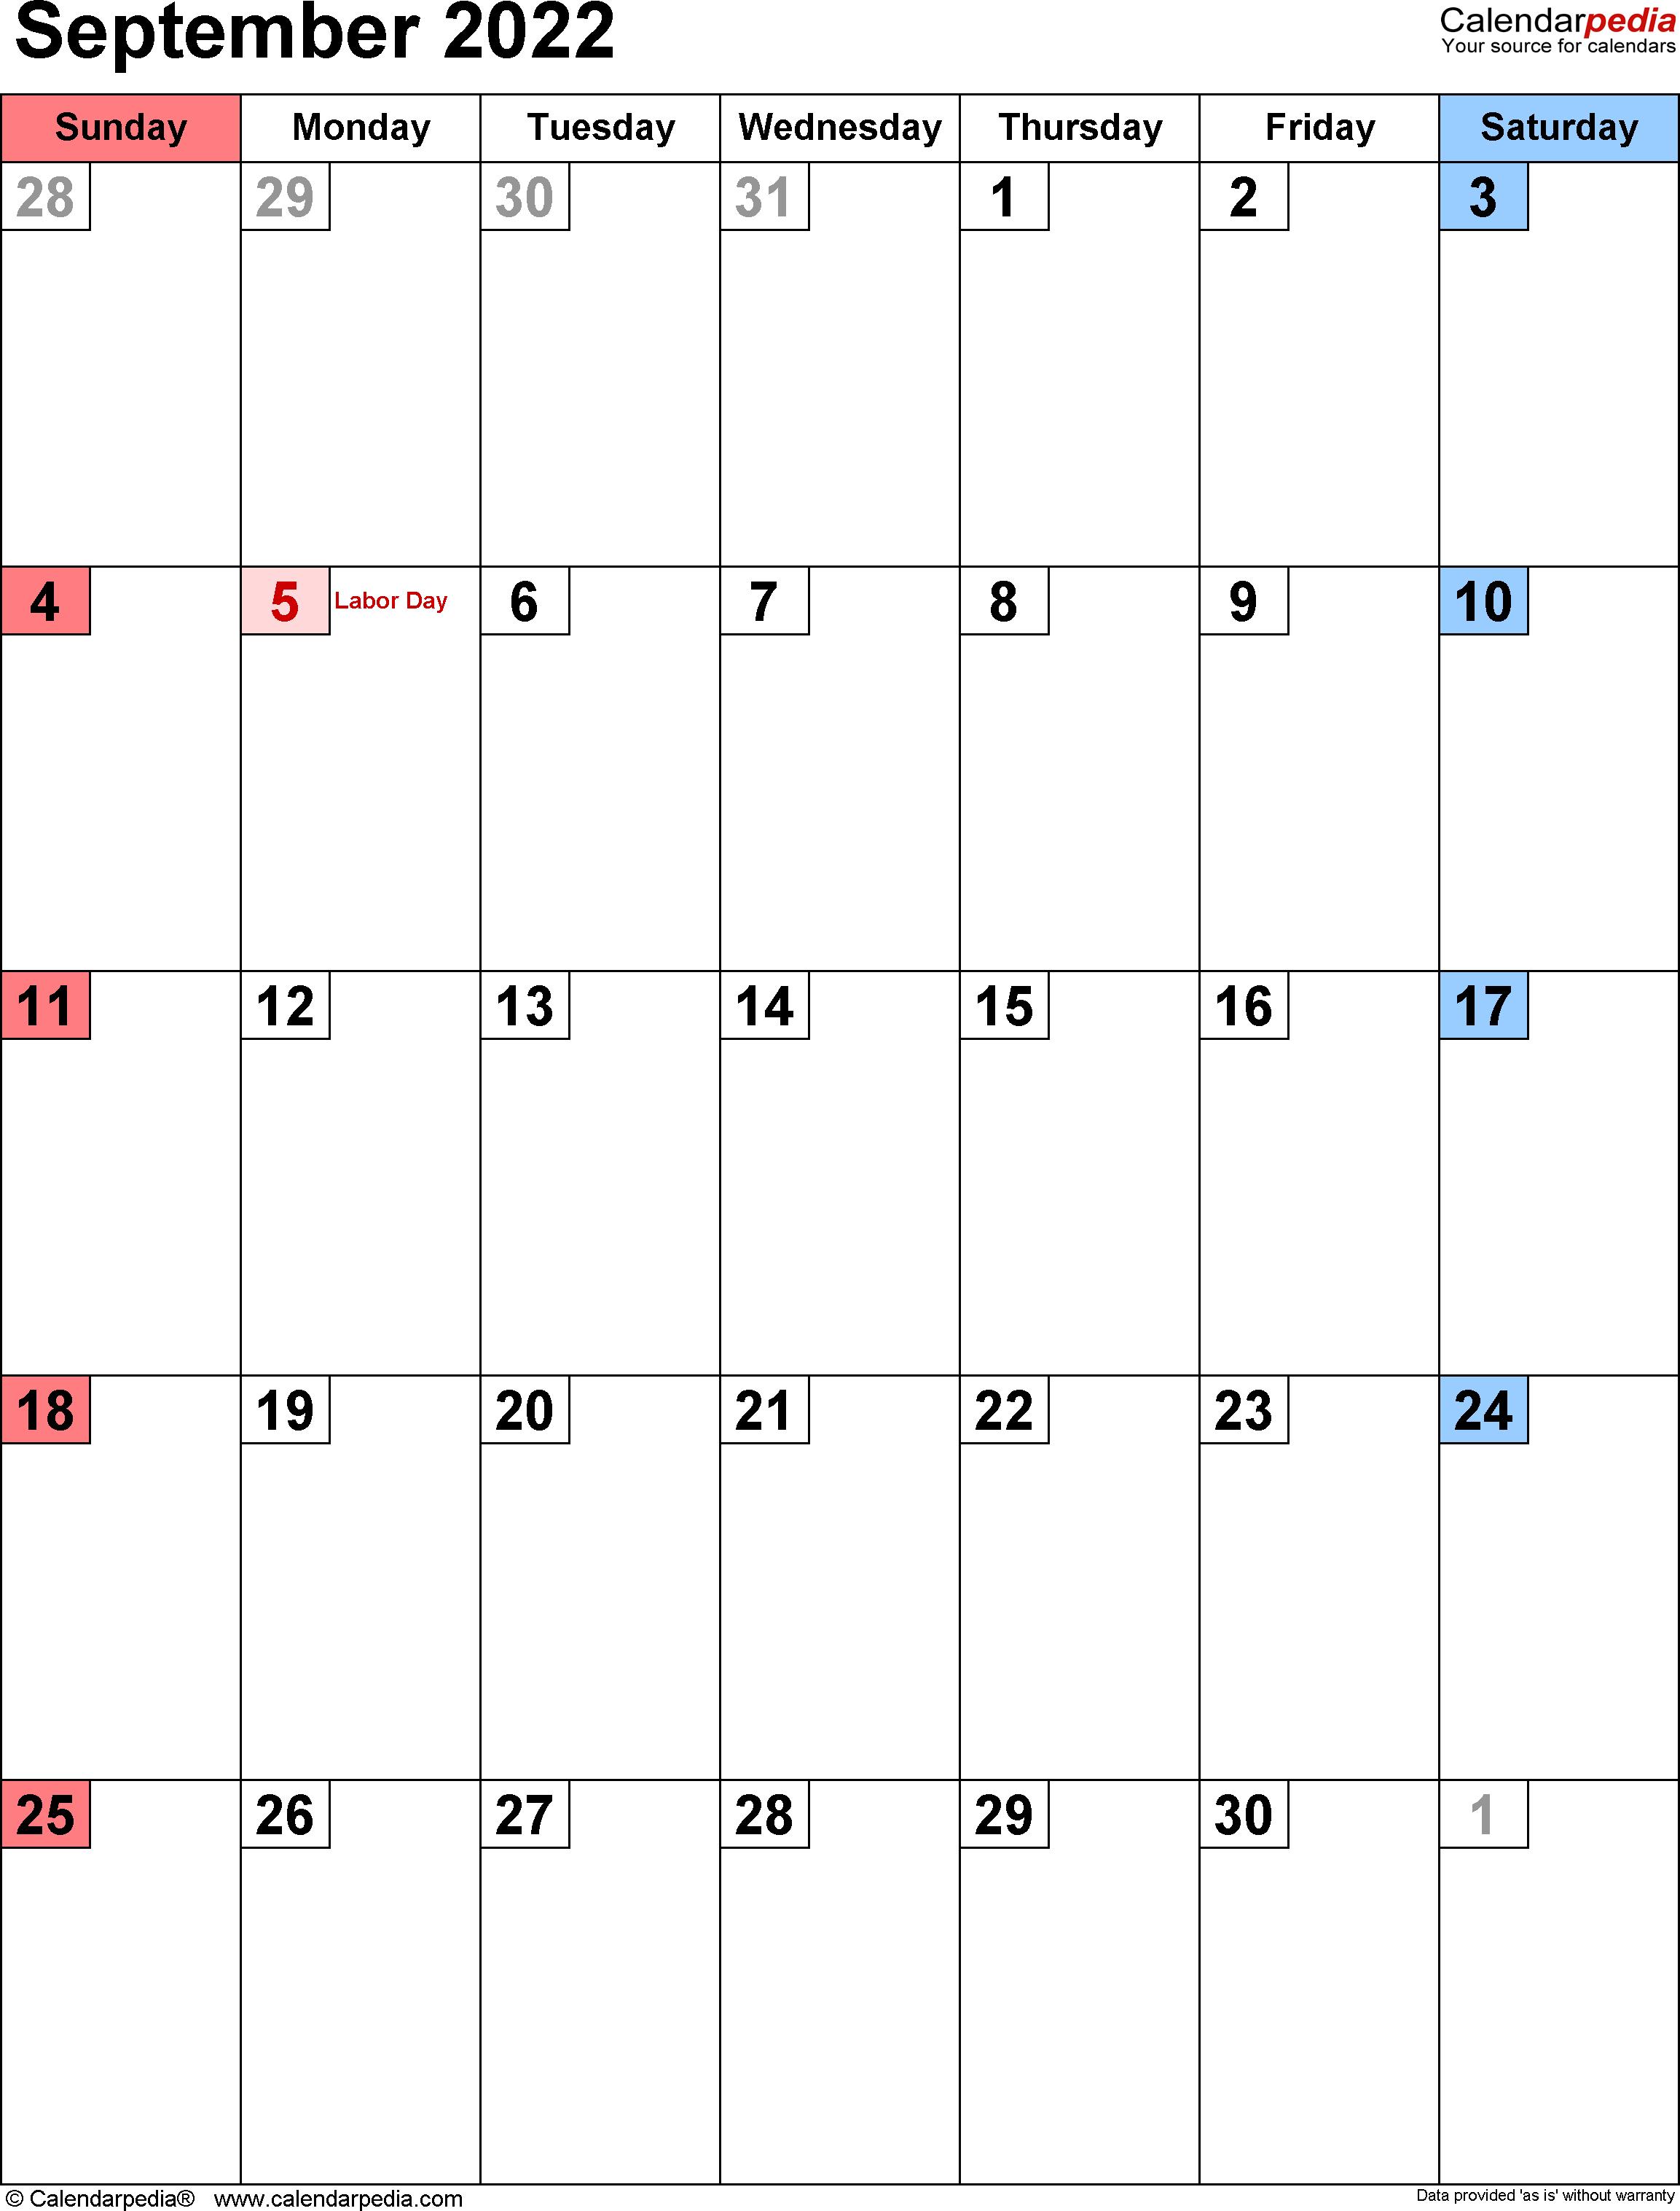 Printable Monthly Calendar September 2022.September 2022 Calendar Templates For Word Excel And Pdf